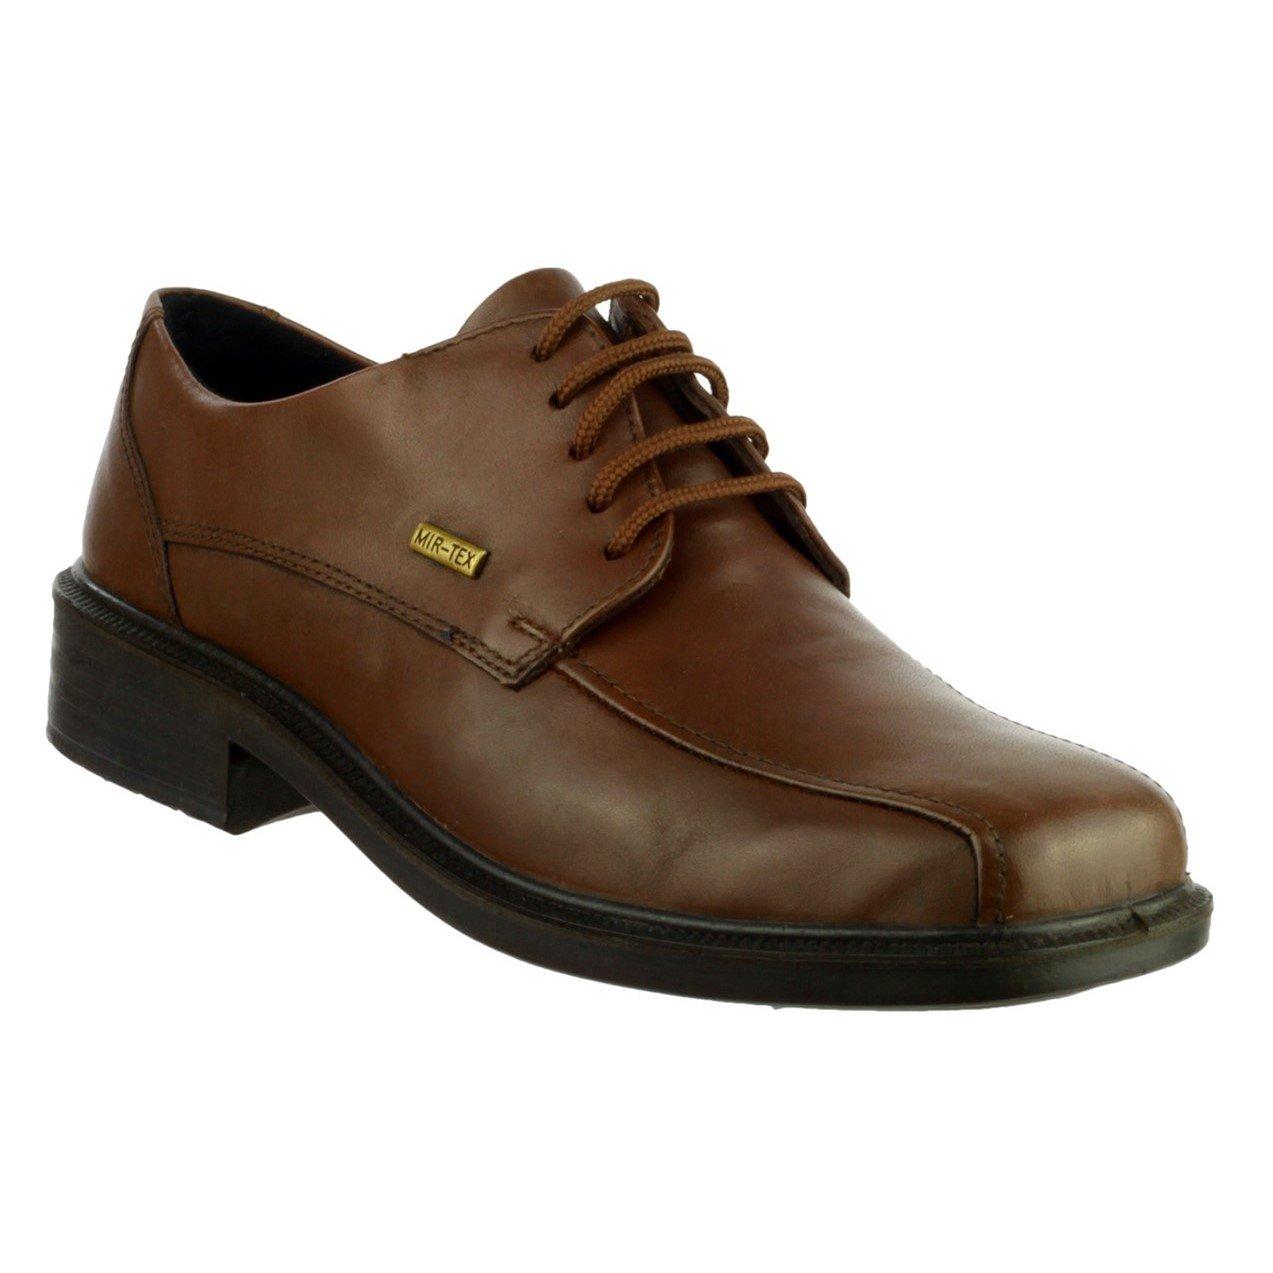 Cotswold Men's Stonehouse Waterproof Shoe Various Colours 32971 - Brown 6